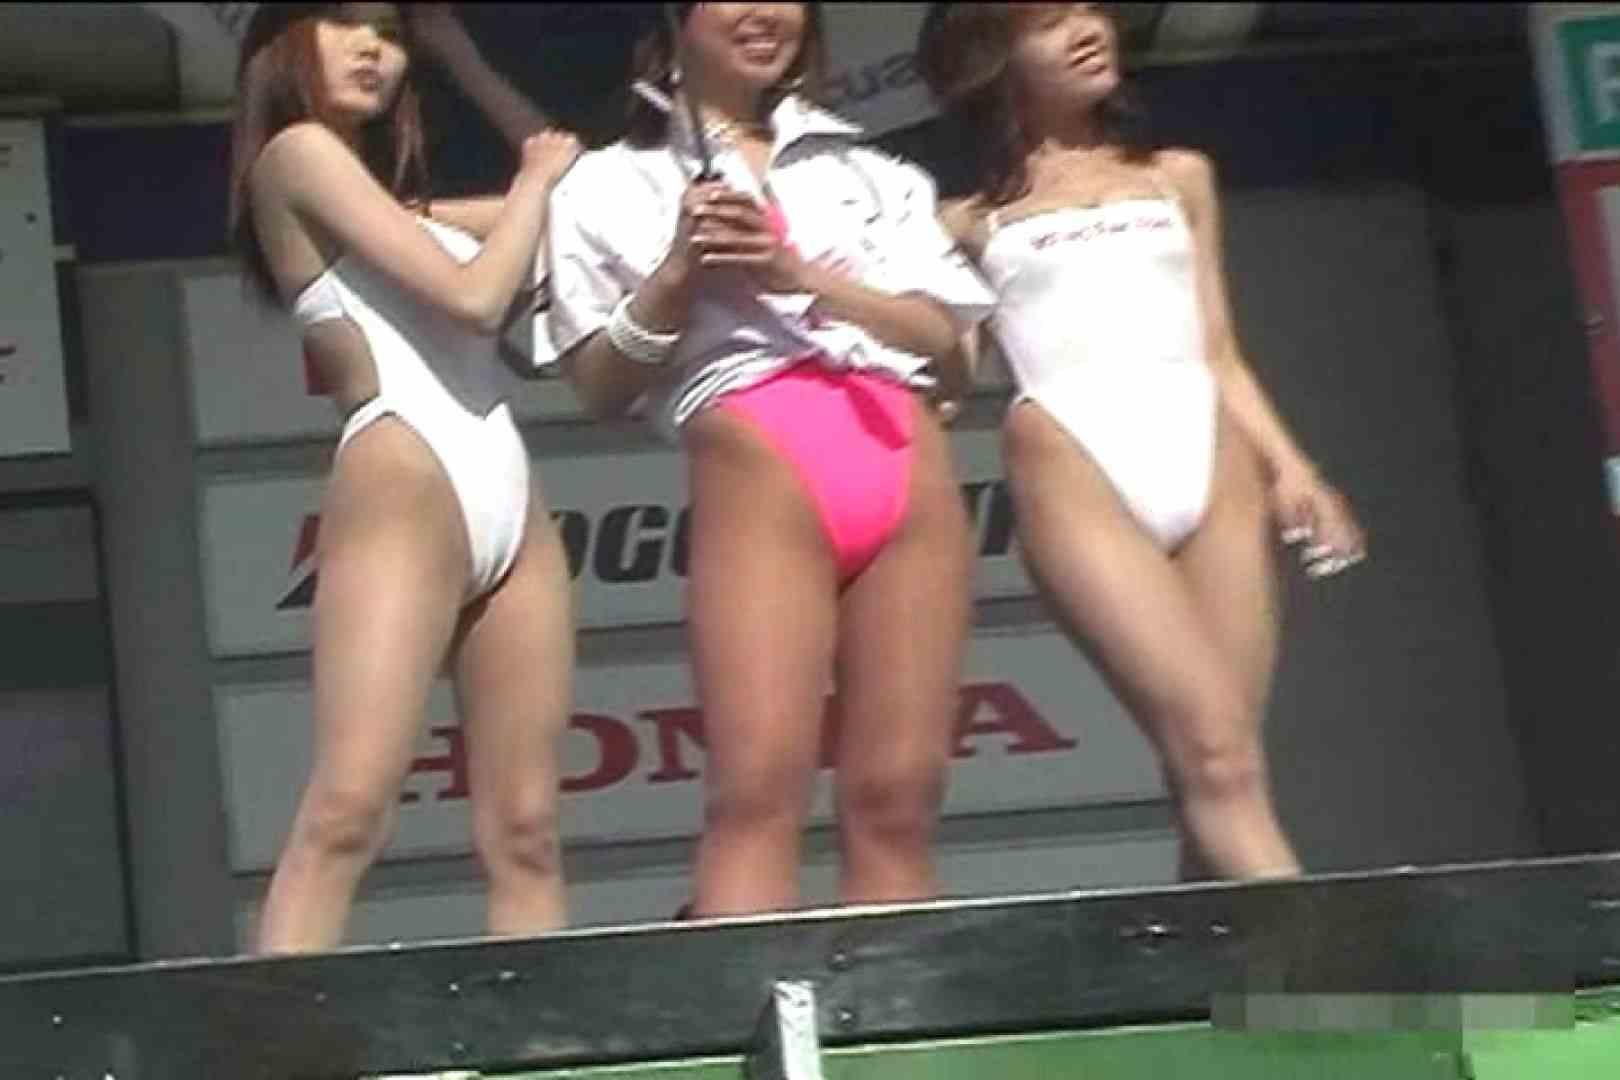 RQカメラ地獄Vol.14 美女OL  42連発 36